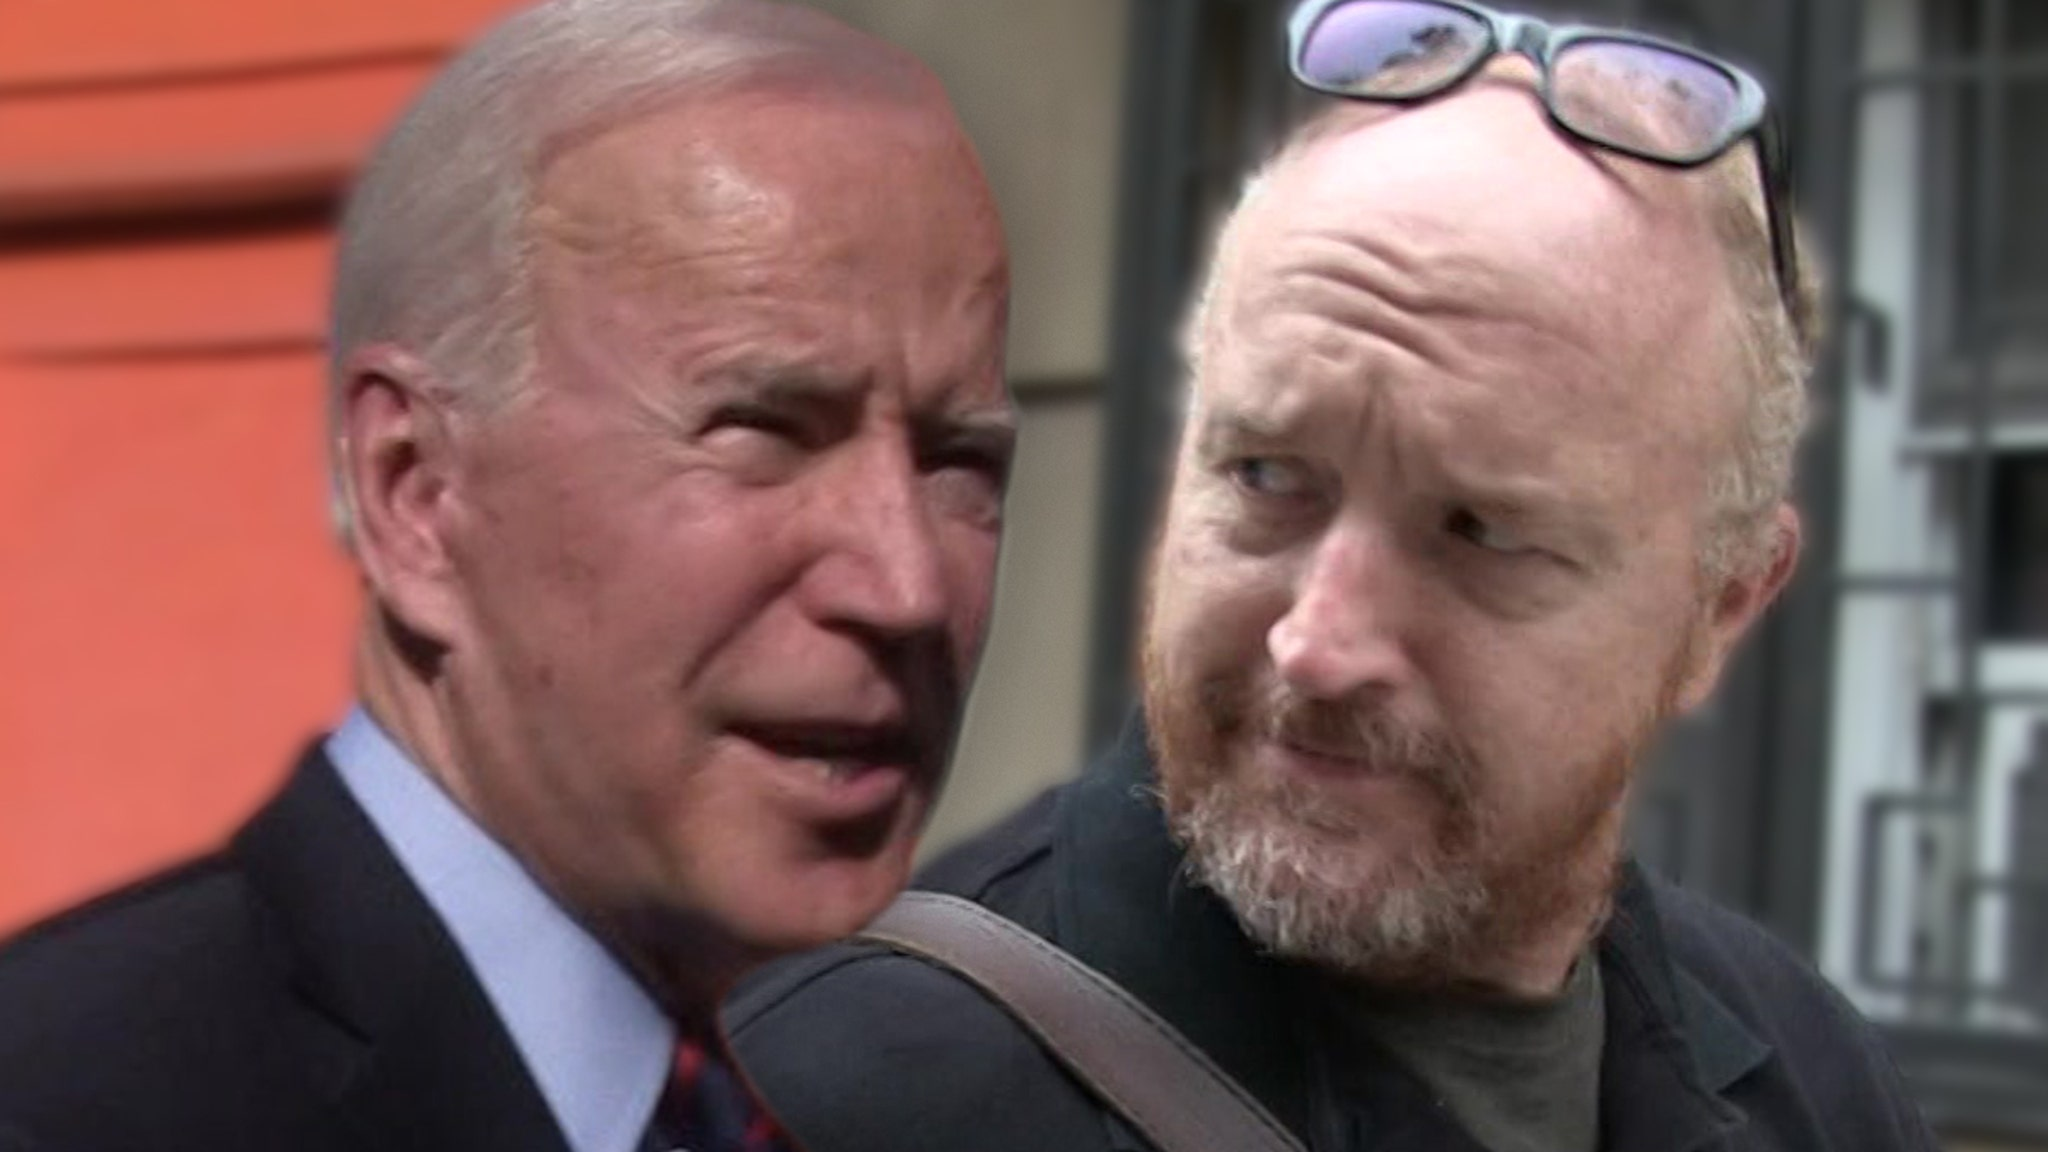 Joe Biden No Thanks, Louis C.K. ... Campaign Returns Donation